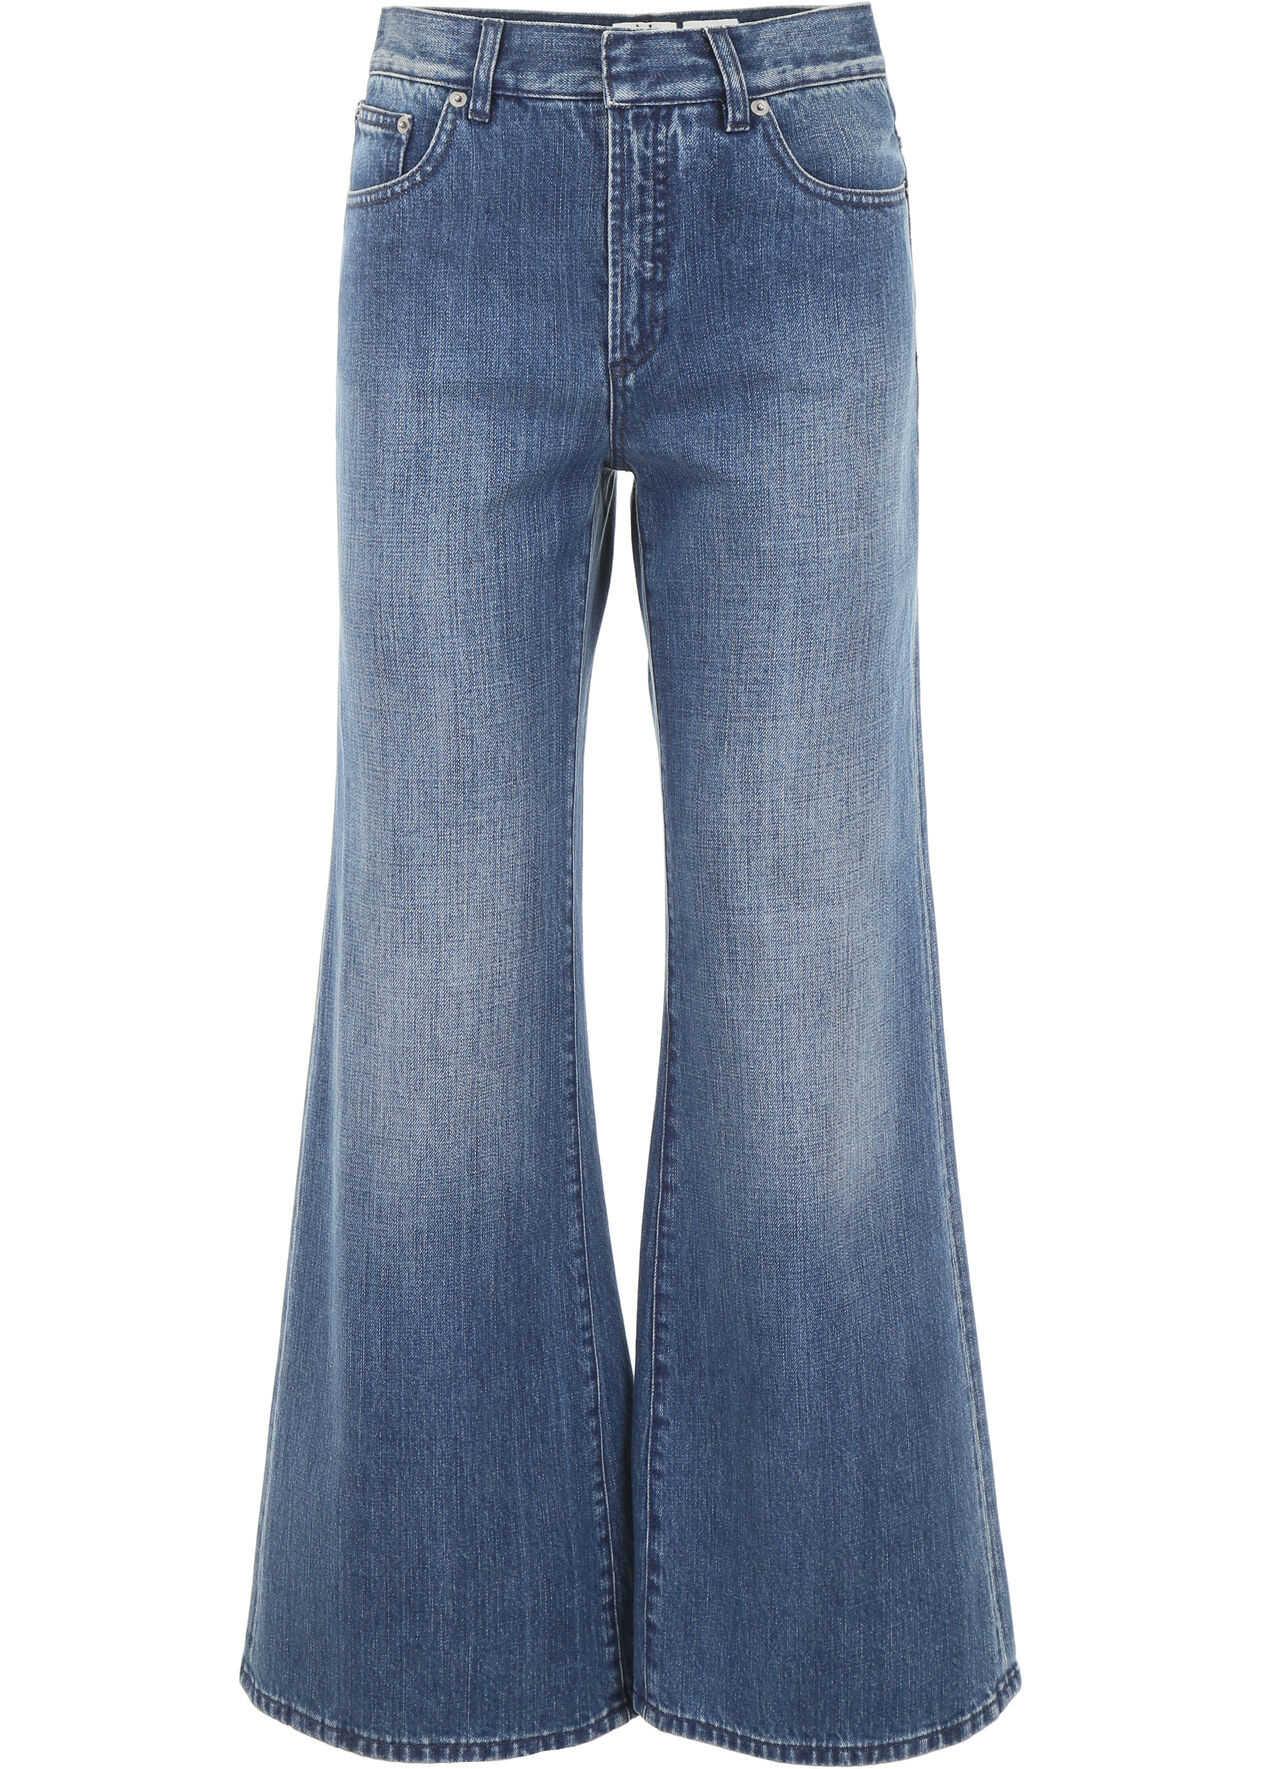 Dior Flare Jeans BLEU